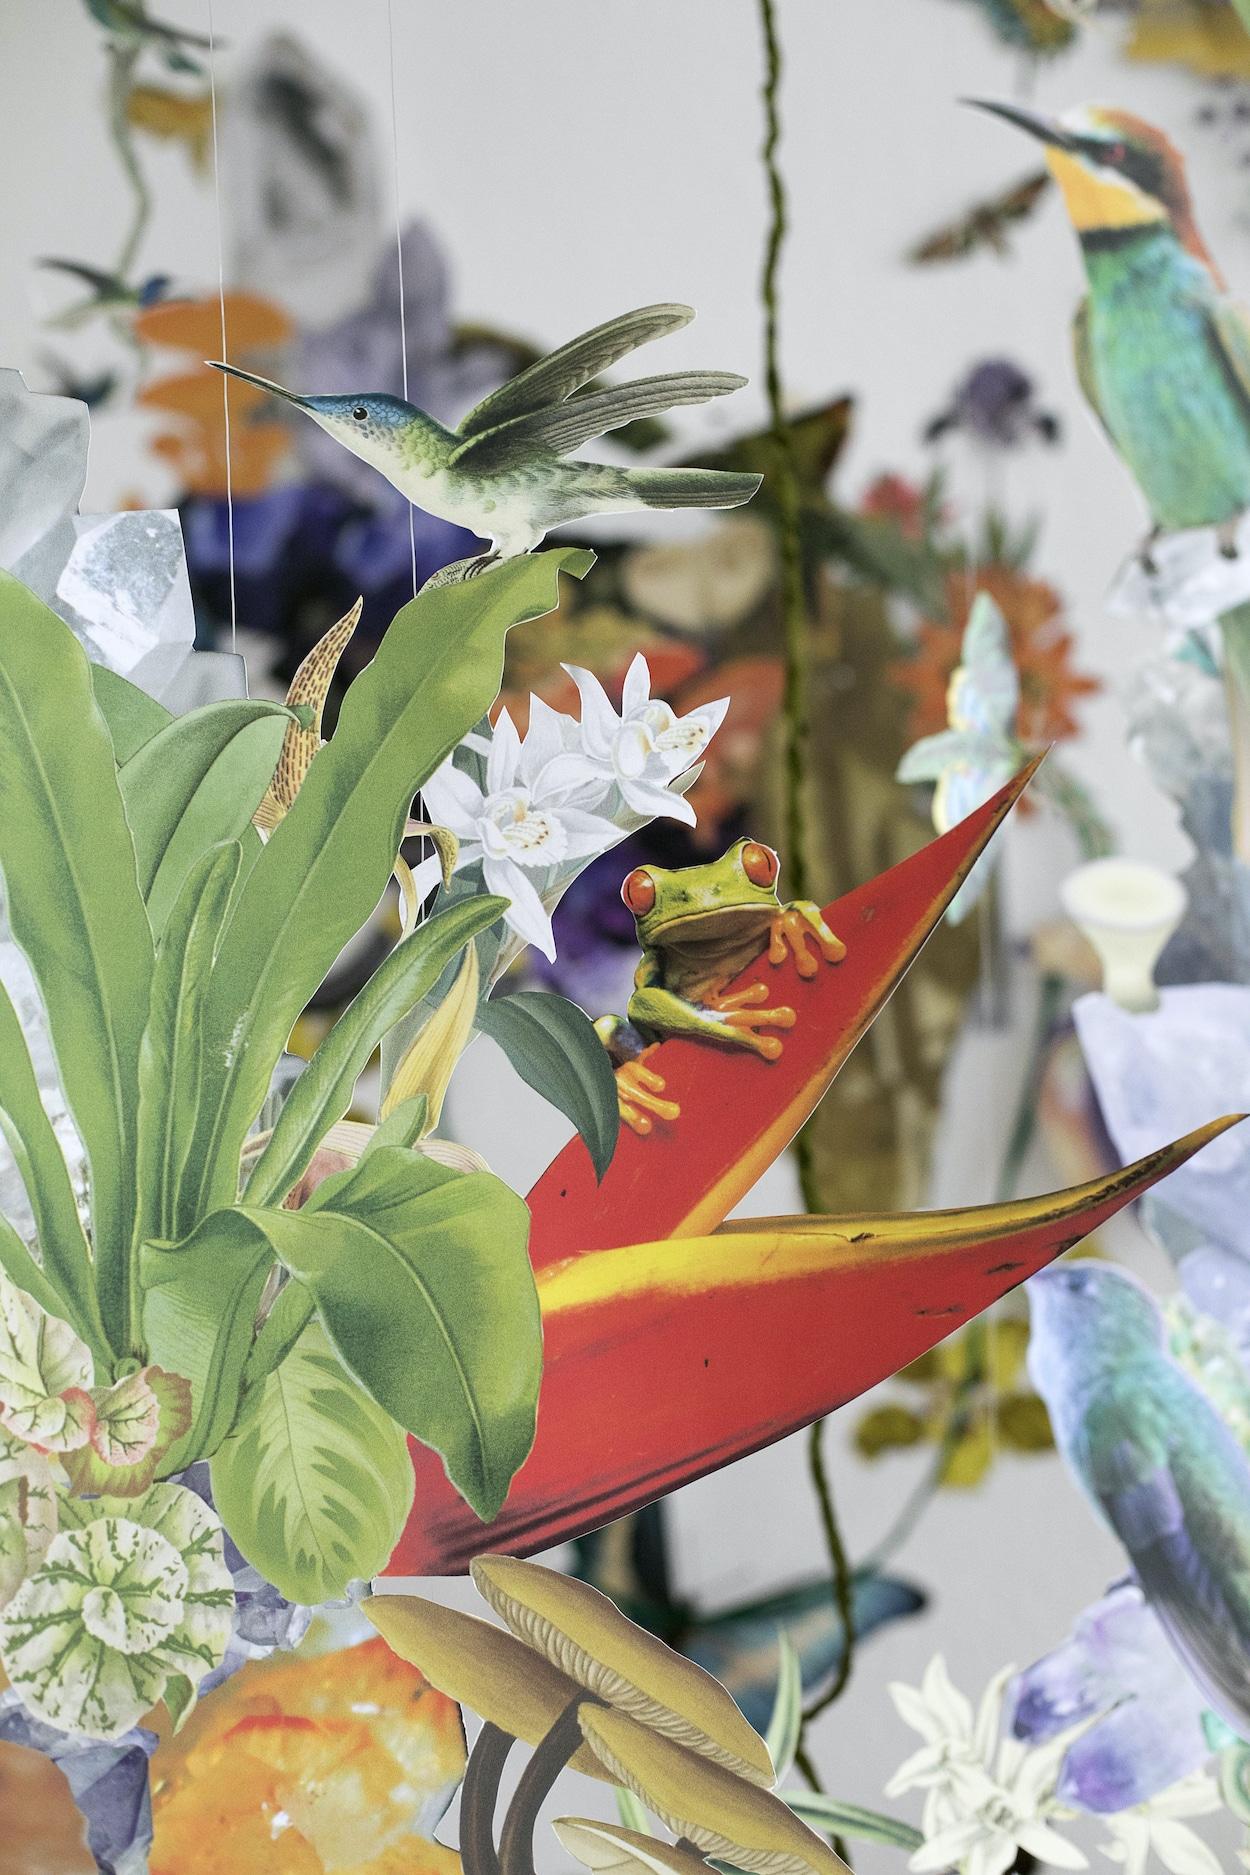 Installation Art Displaying Biodiversity